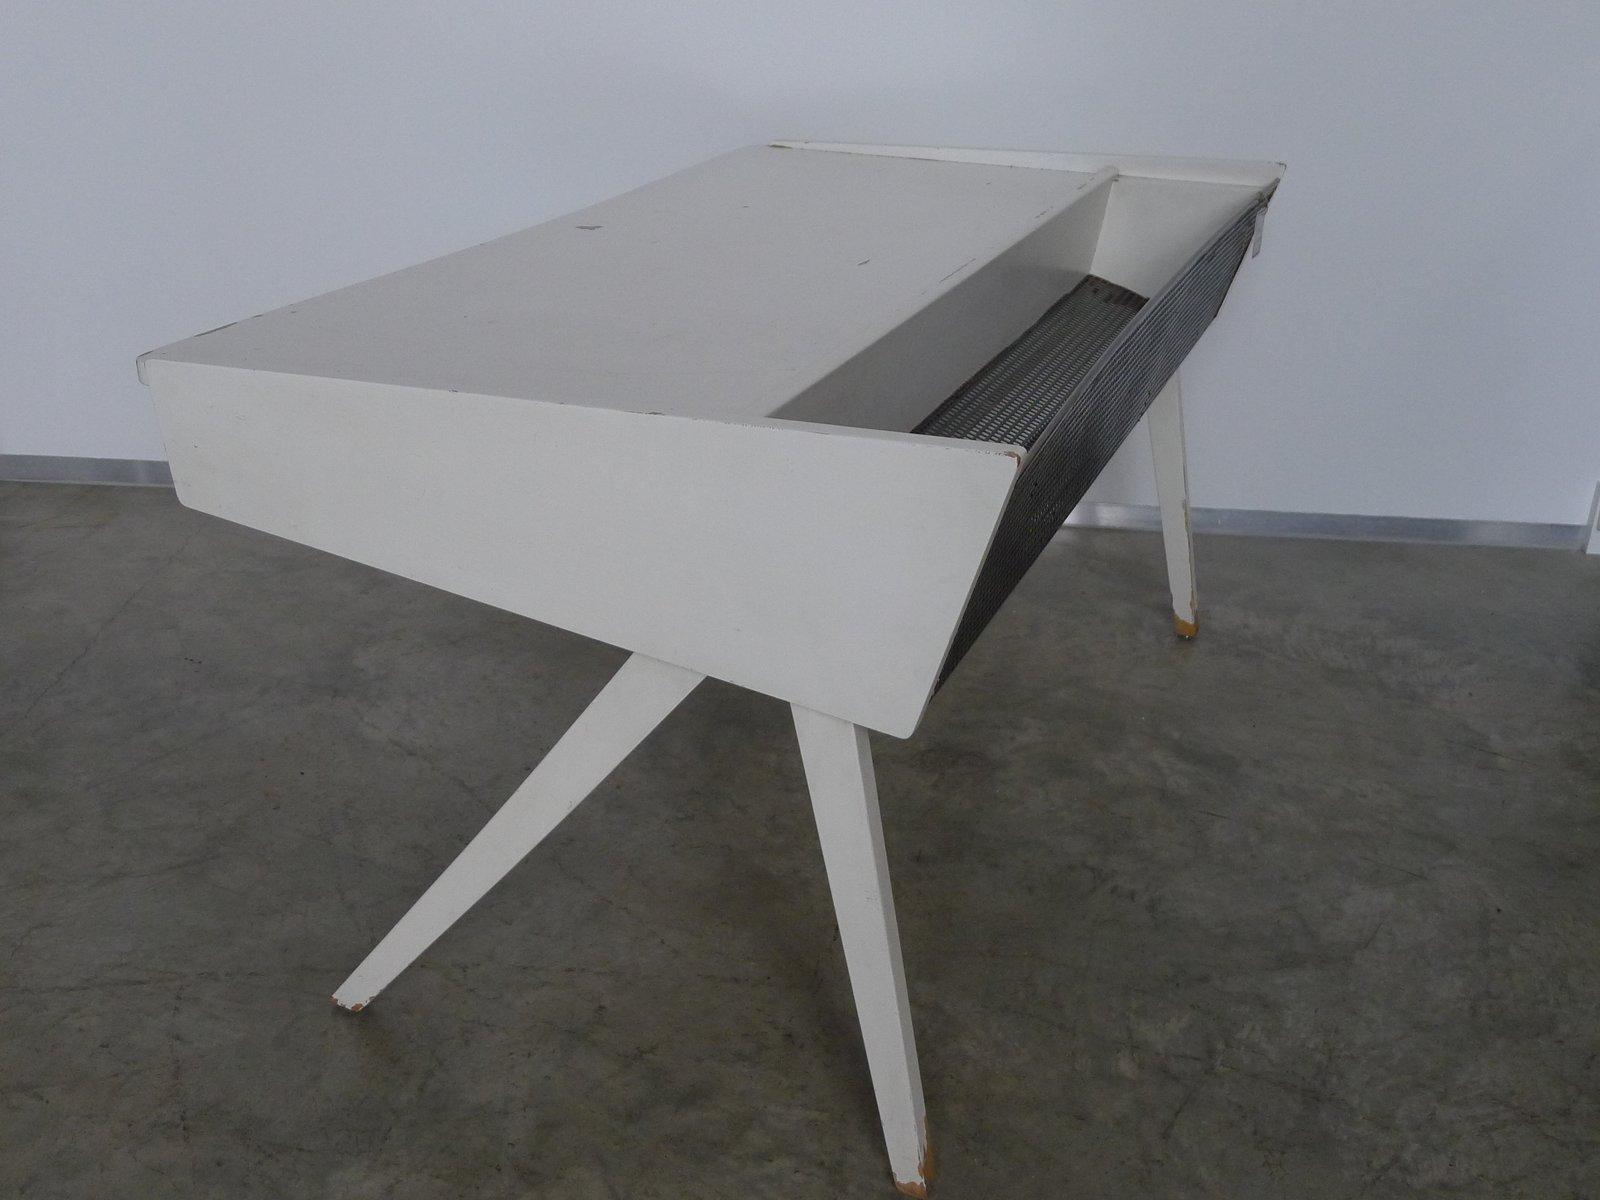 bureau vintage blanc 1950s en vente sur pamono. Black Bedroom Furniture Sets. Home Design Ideas